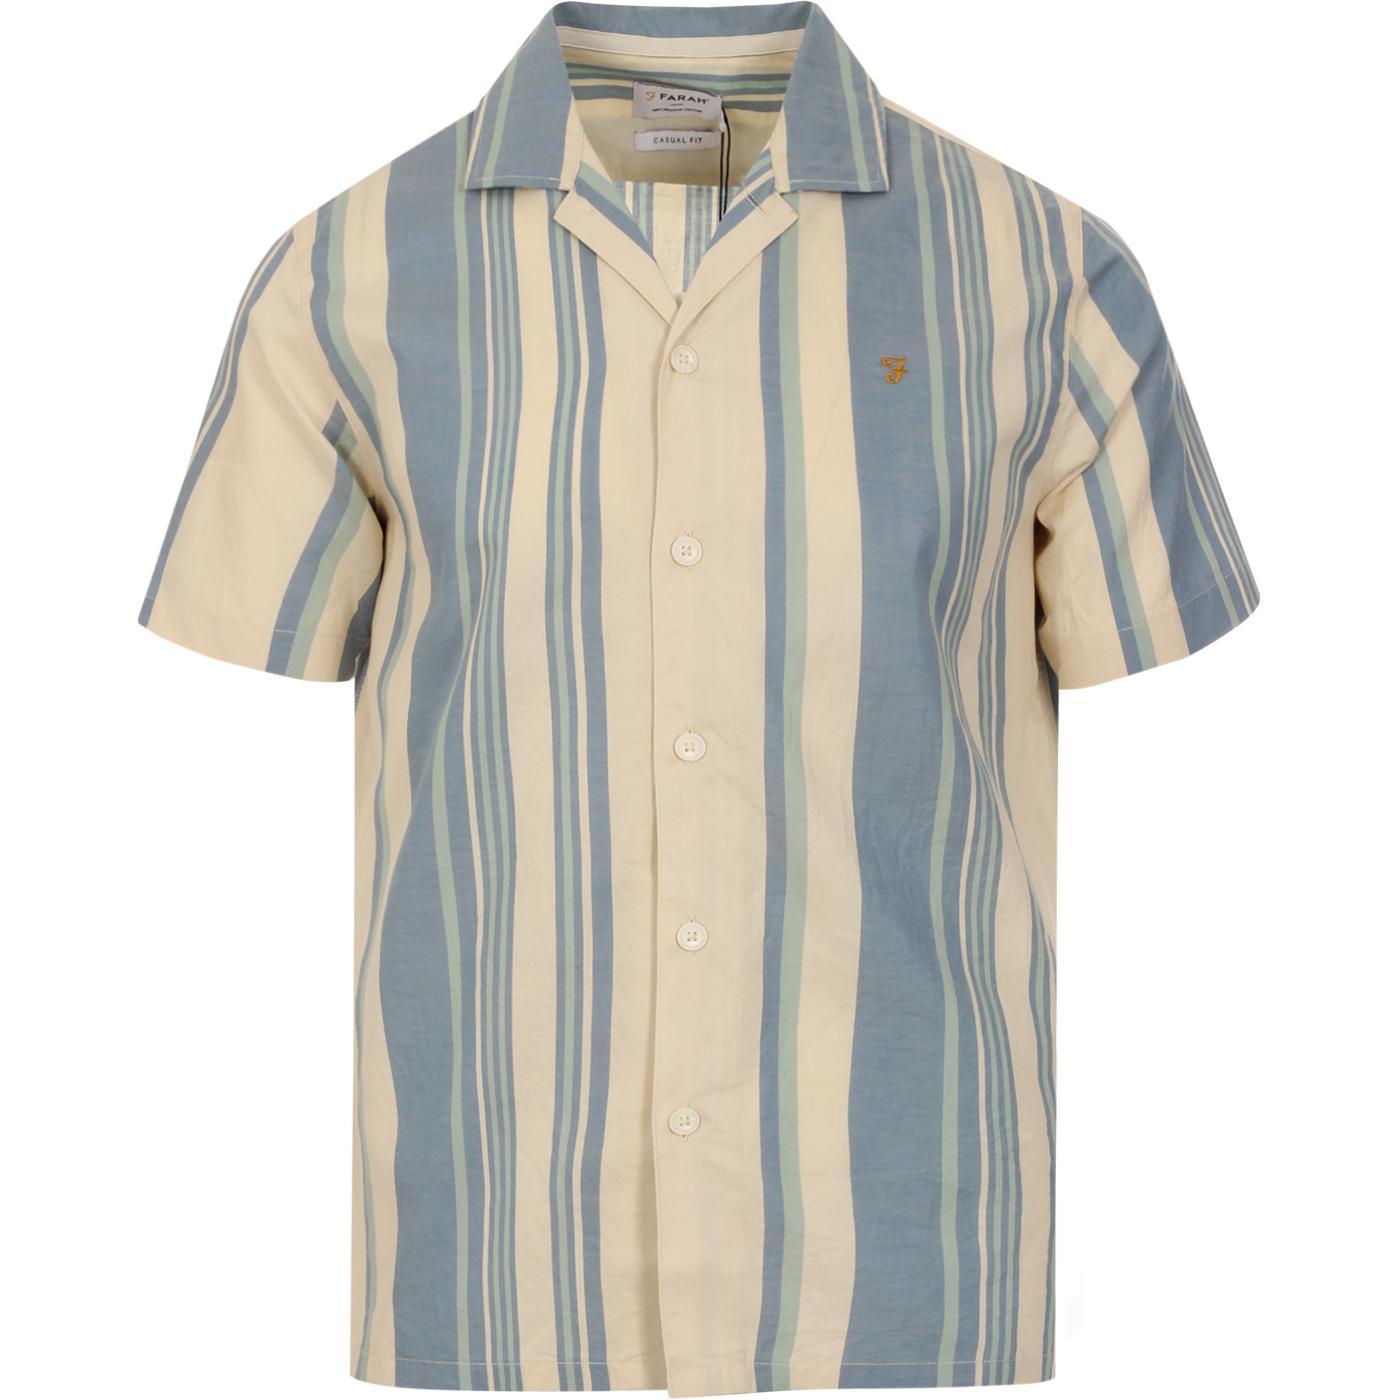 Theroux FARAH Retro 70s Stripe Revere Collar Shirt